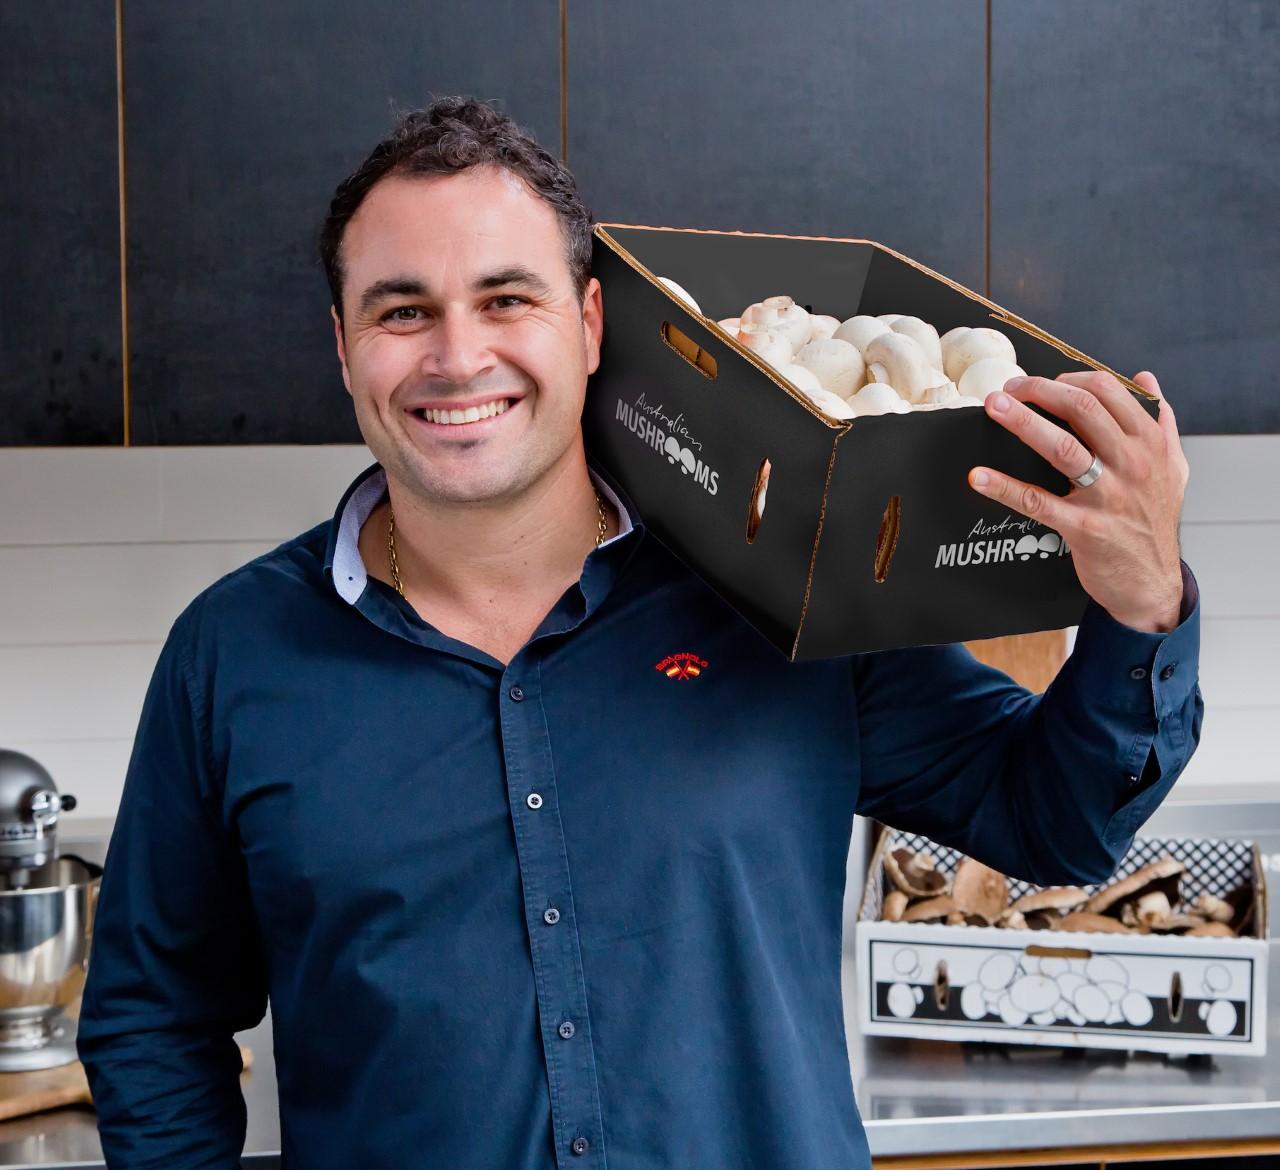 Miguel Maestre, australian mushrooms